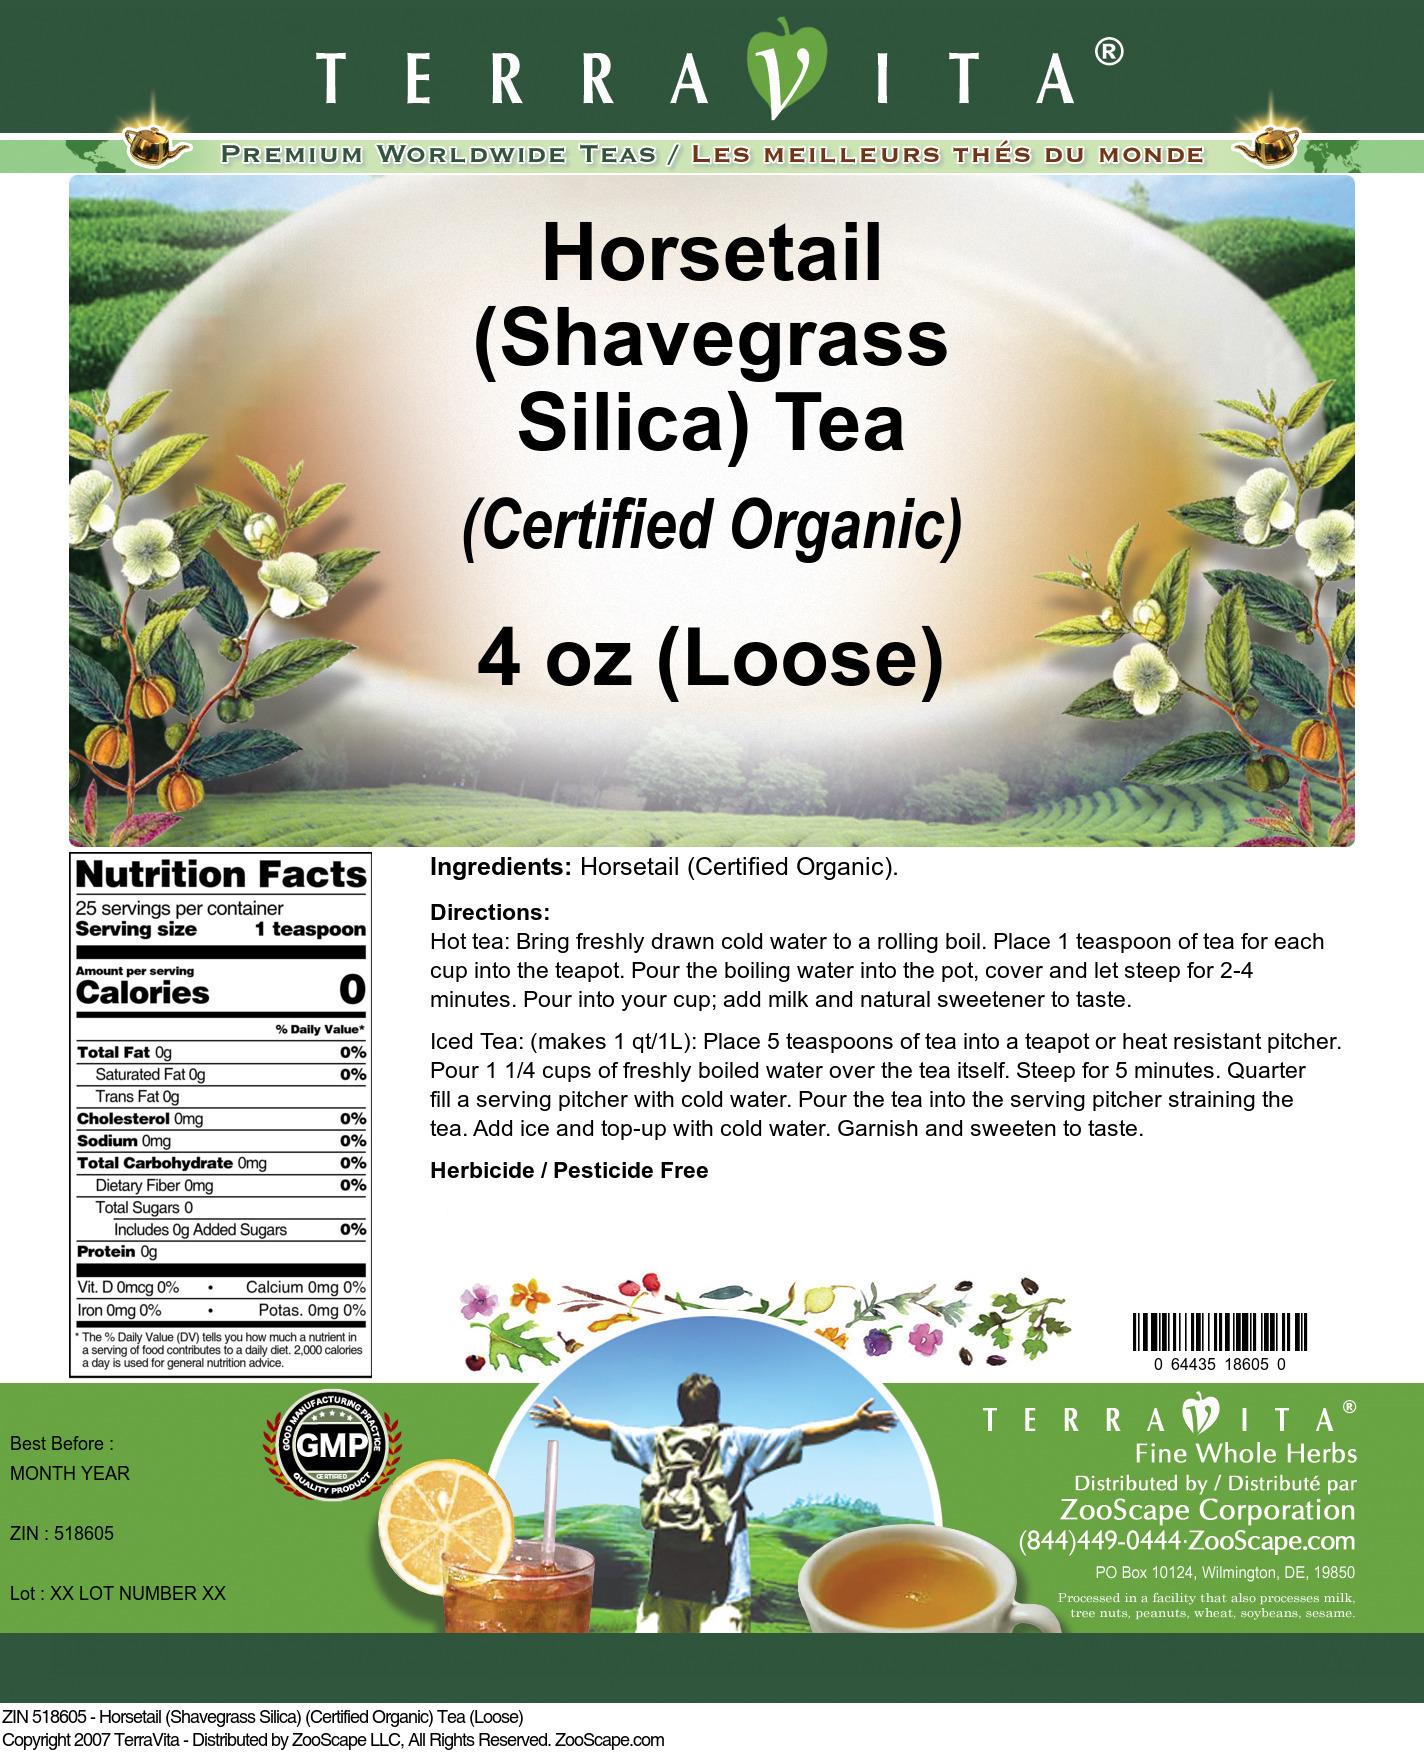 Horsetail (Shavegrass Silica) (Certified Organic) Tea (Loose)